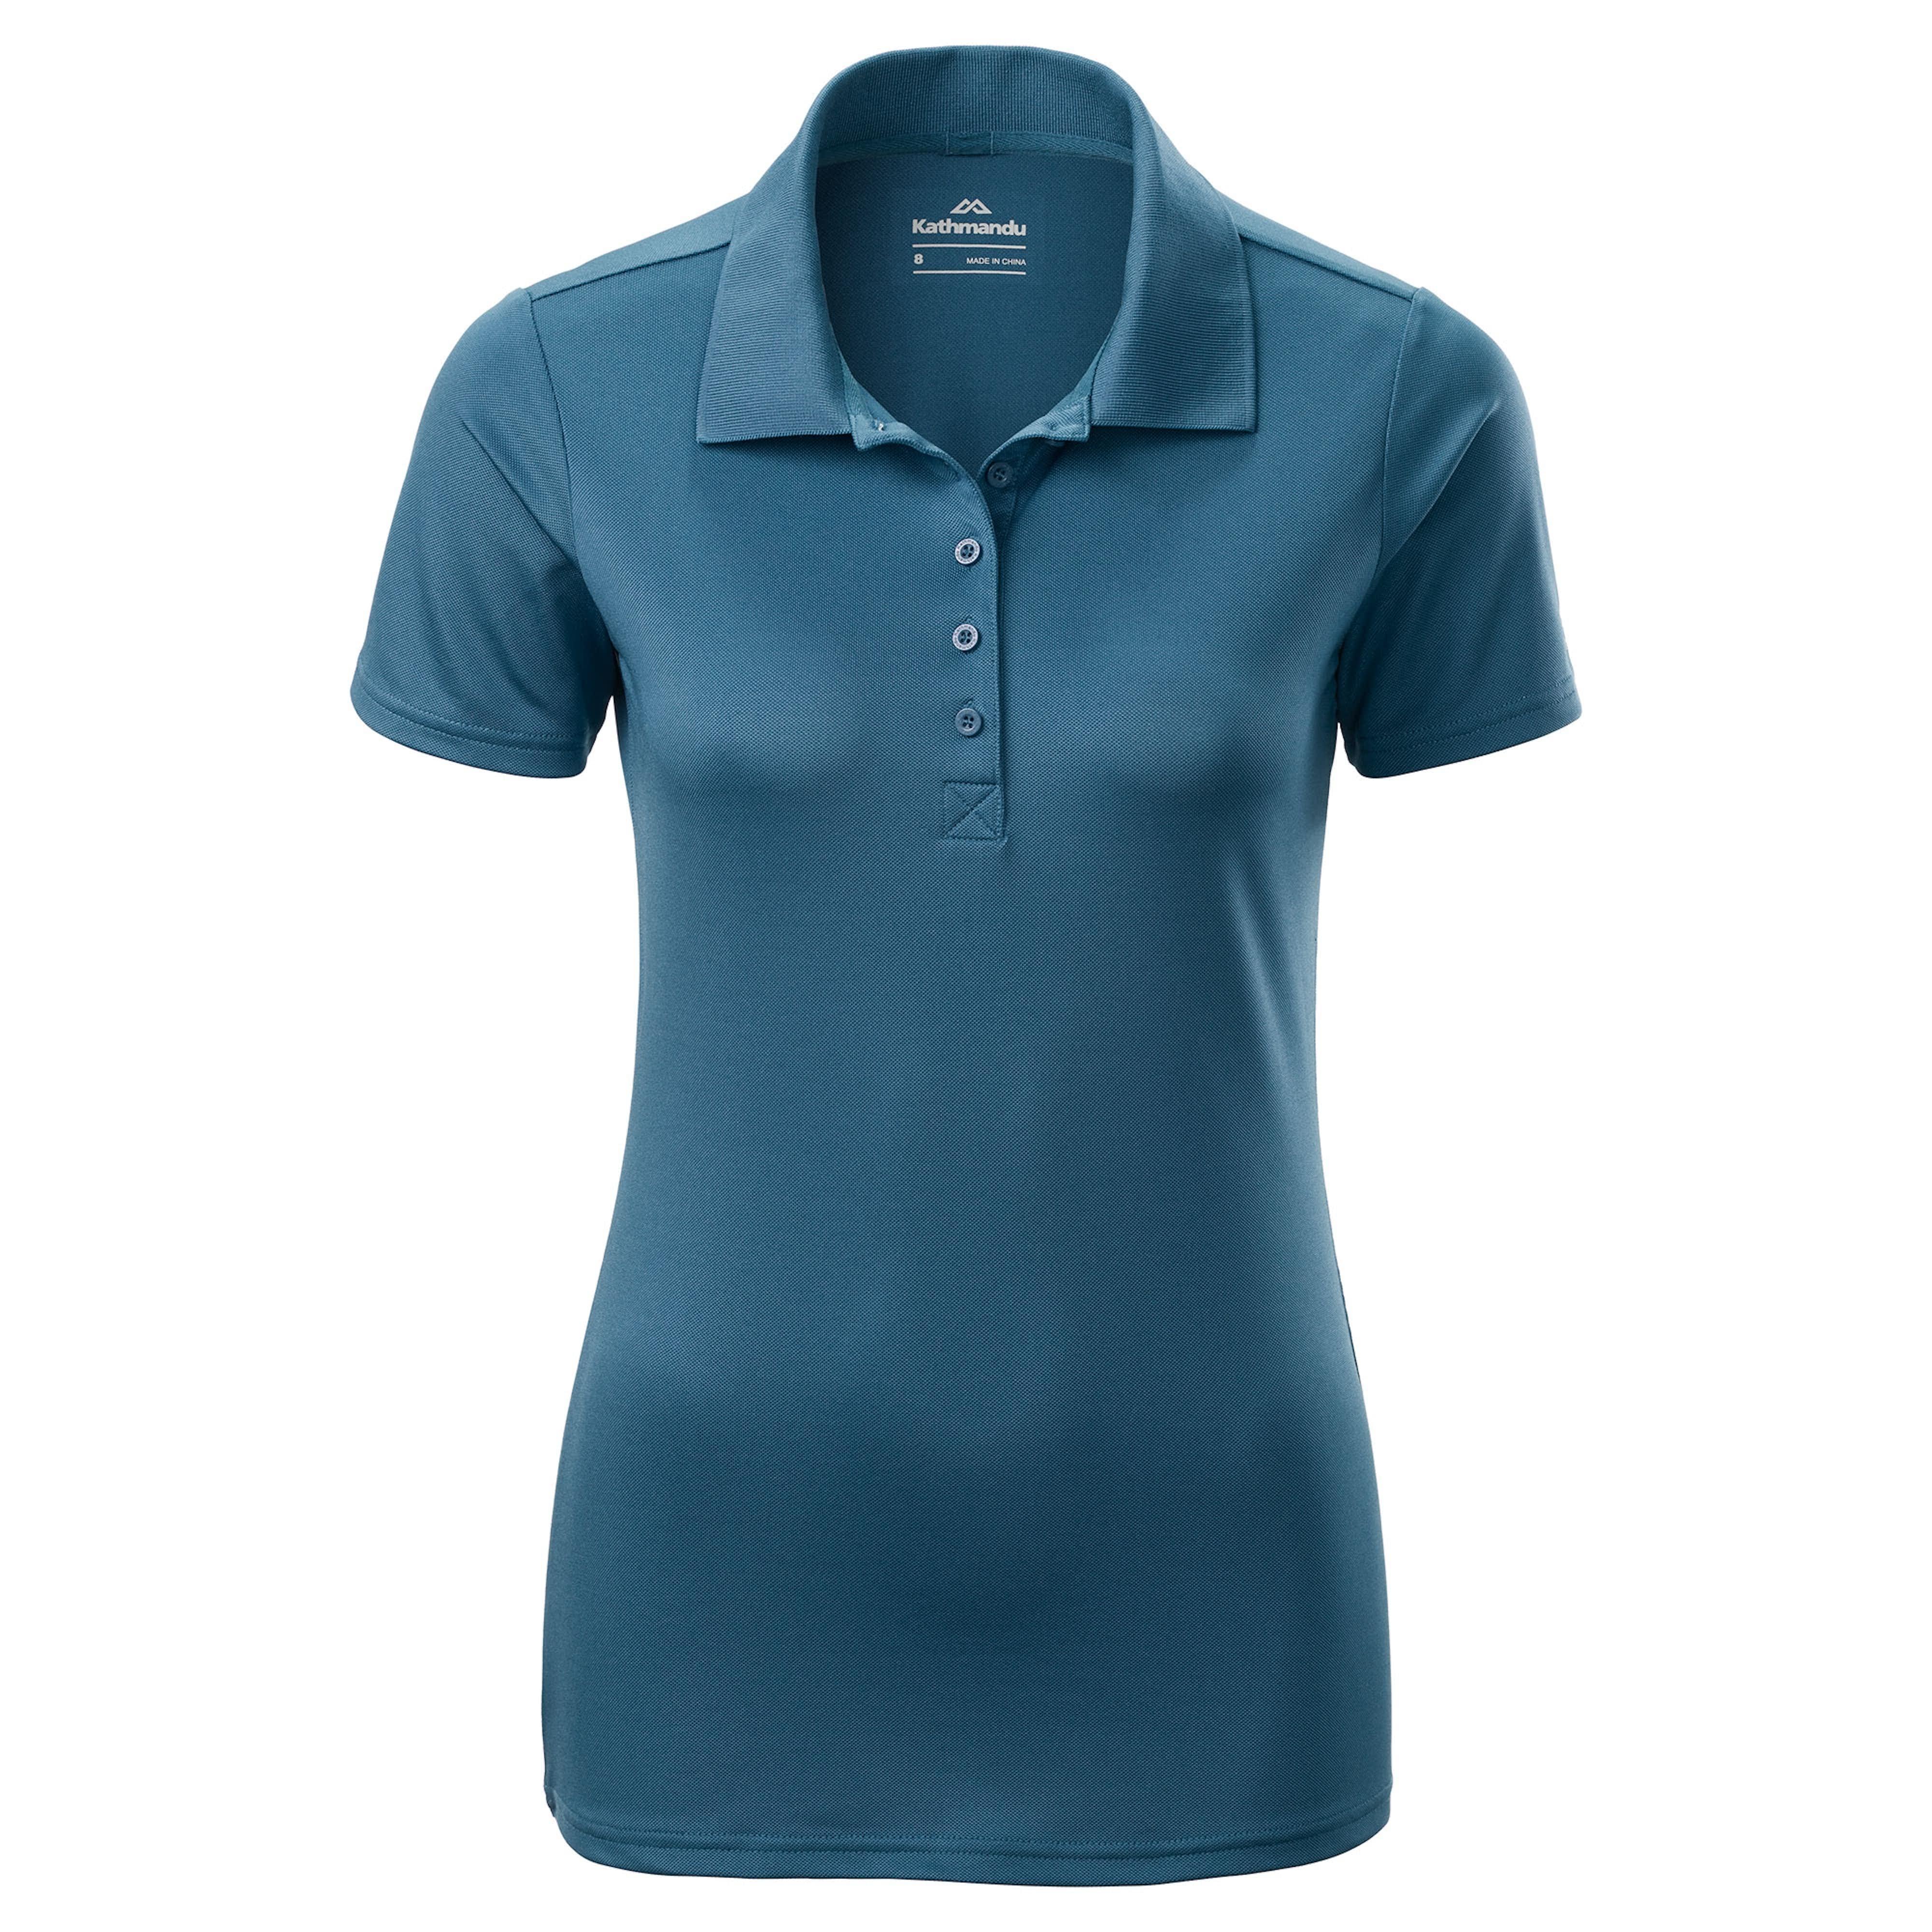 153bcb090 Vanua Women's Short Sleeve Polo Shirt v2 - Putty